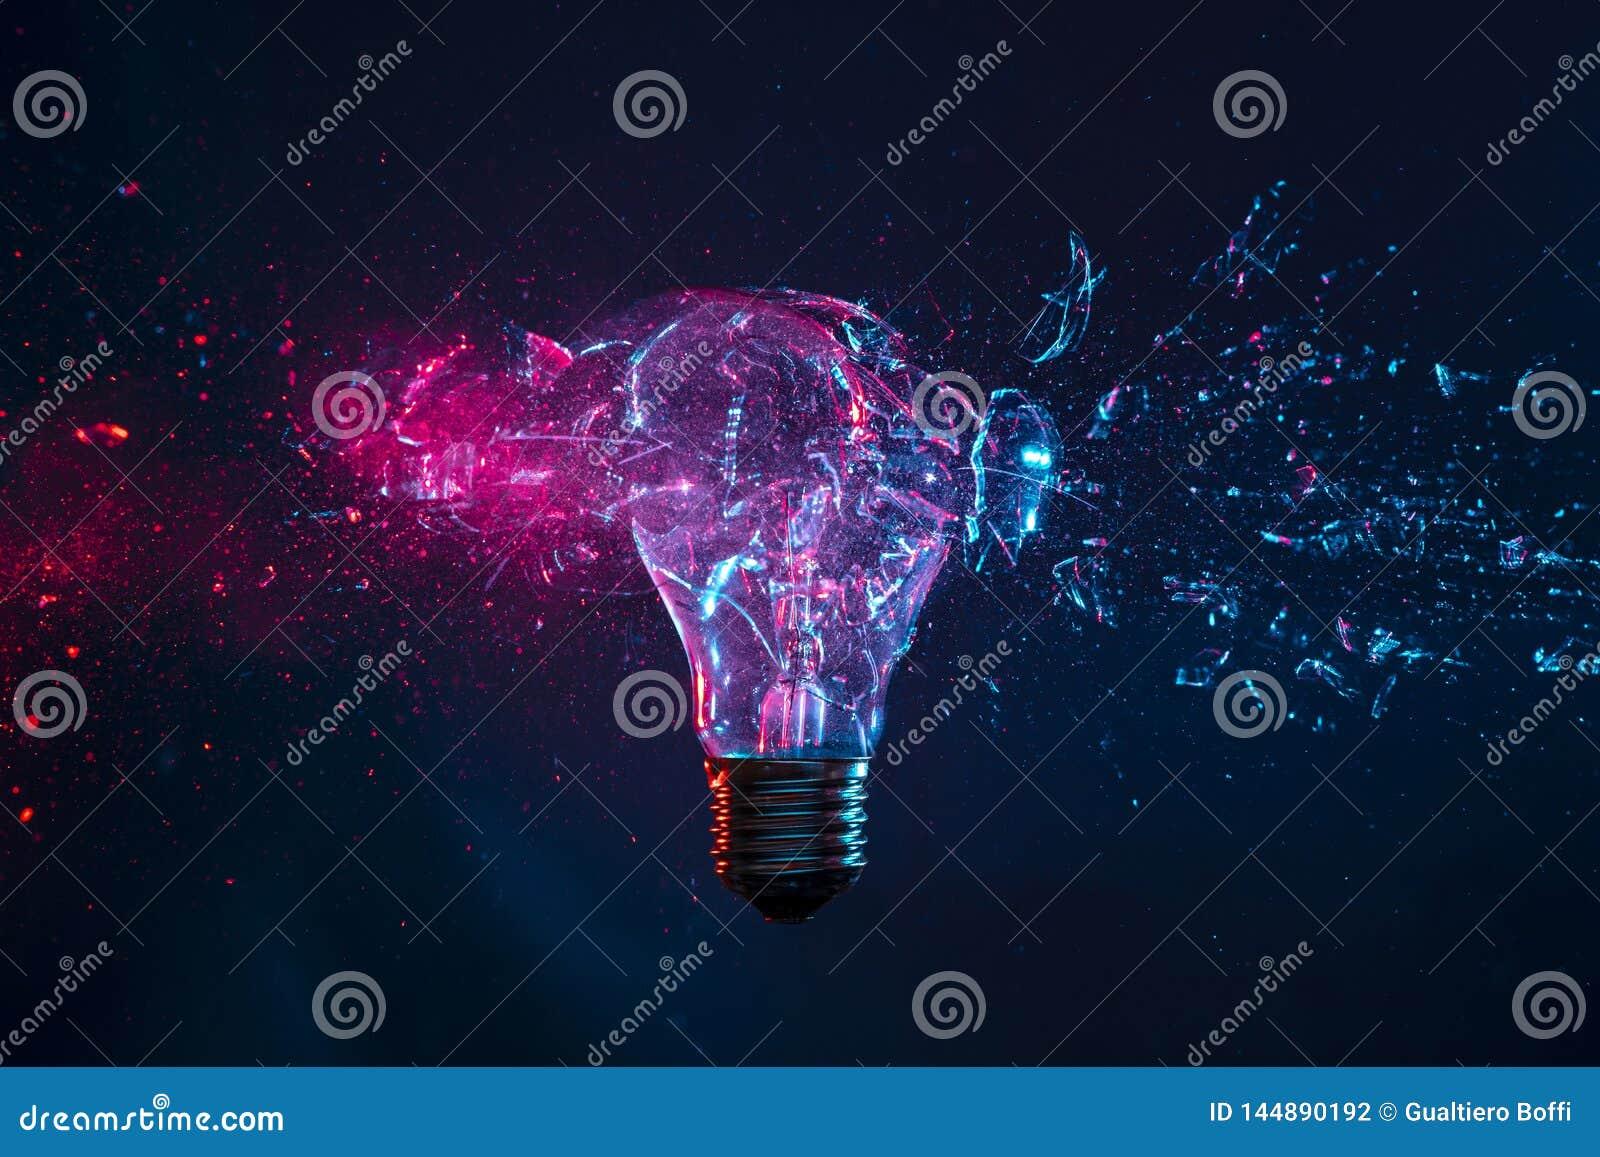 Explosion of a filament light bulb